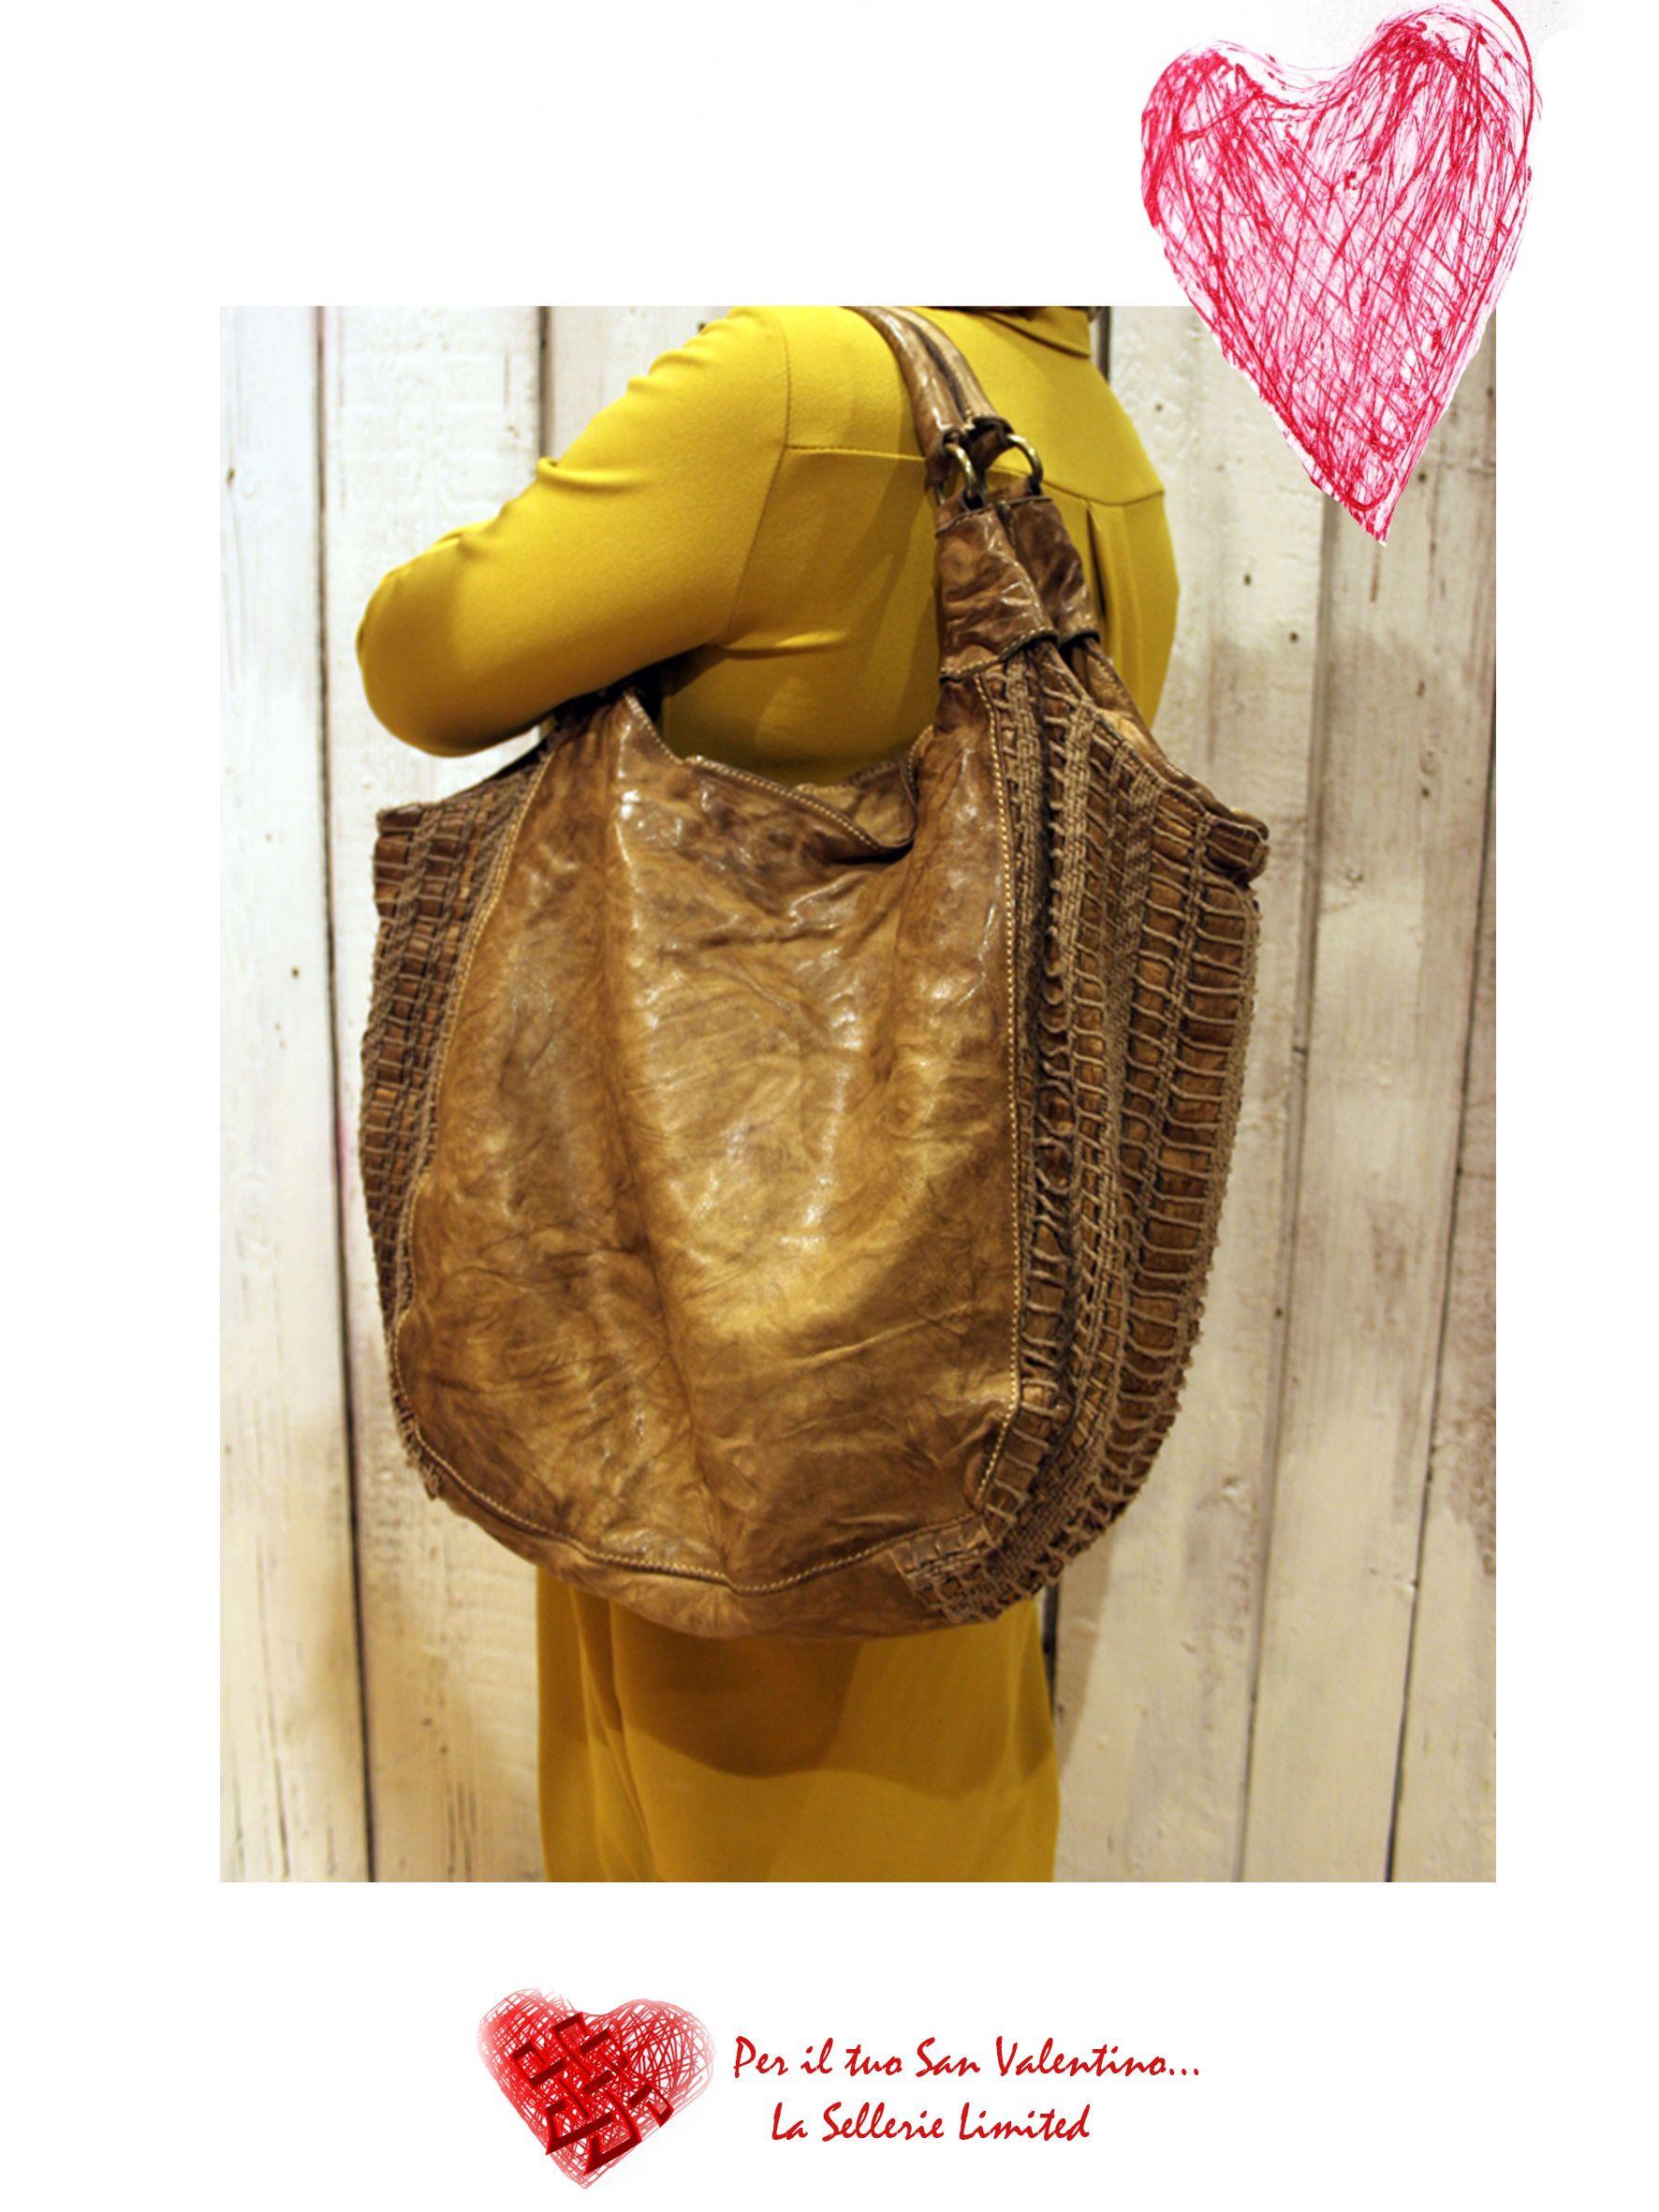 La Sellerie Limited Shop Online On Https Www Etsy Com It Shop Lasellerielimited Ref Hdr Shop Menu Fashion Advertising Campaign Bags